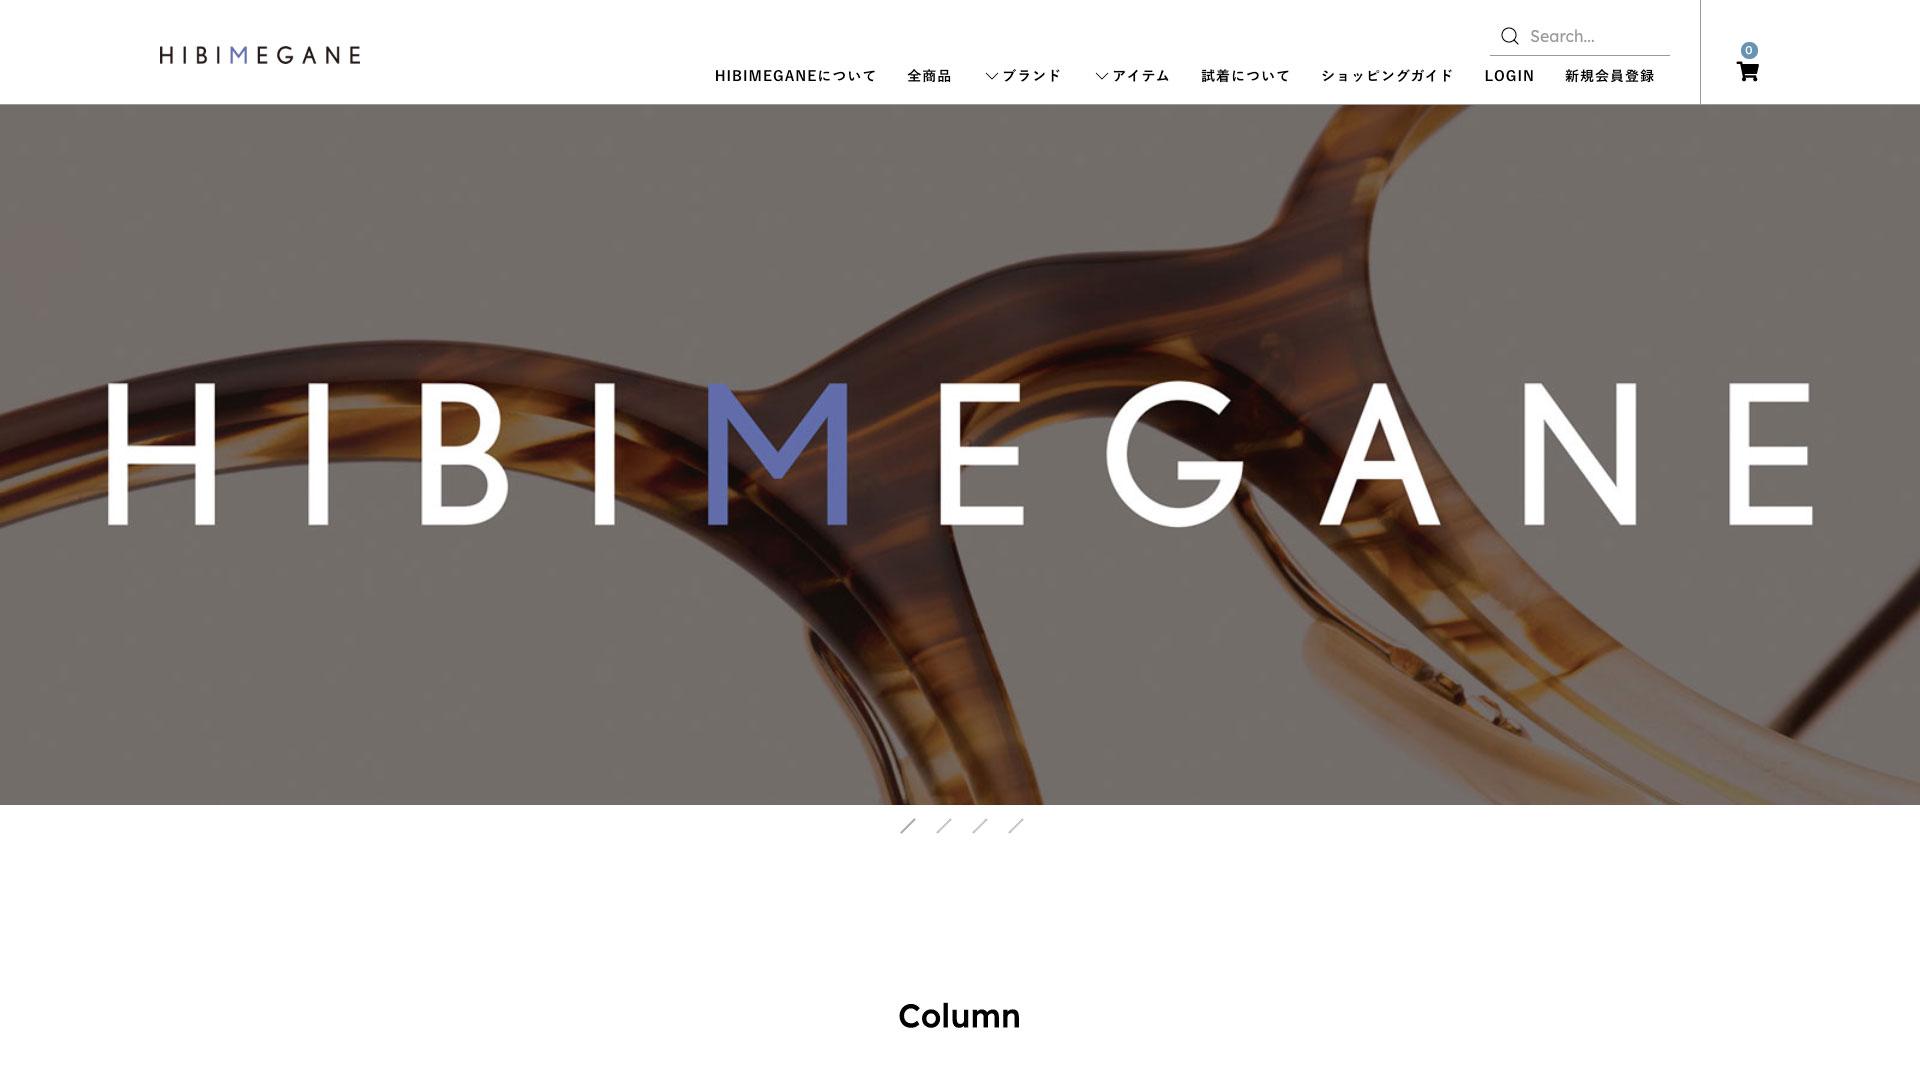 HIBIMEGANE様のサイトイメージ